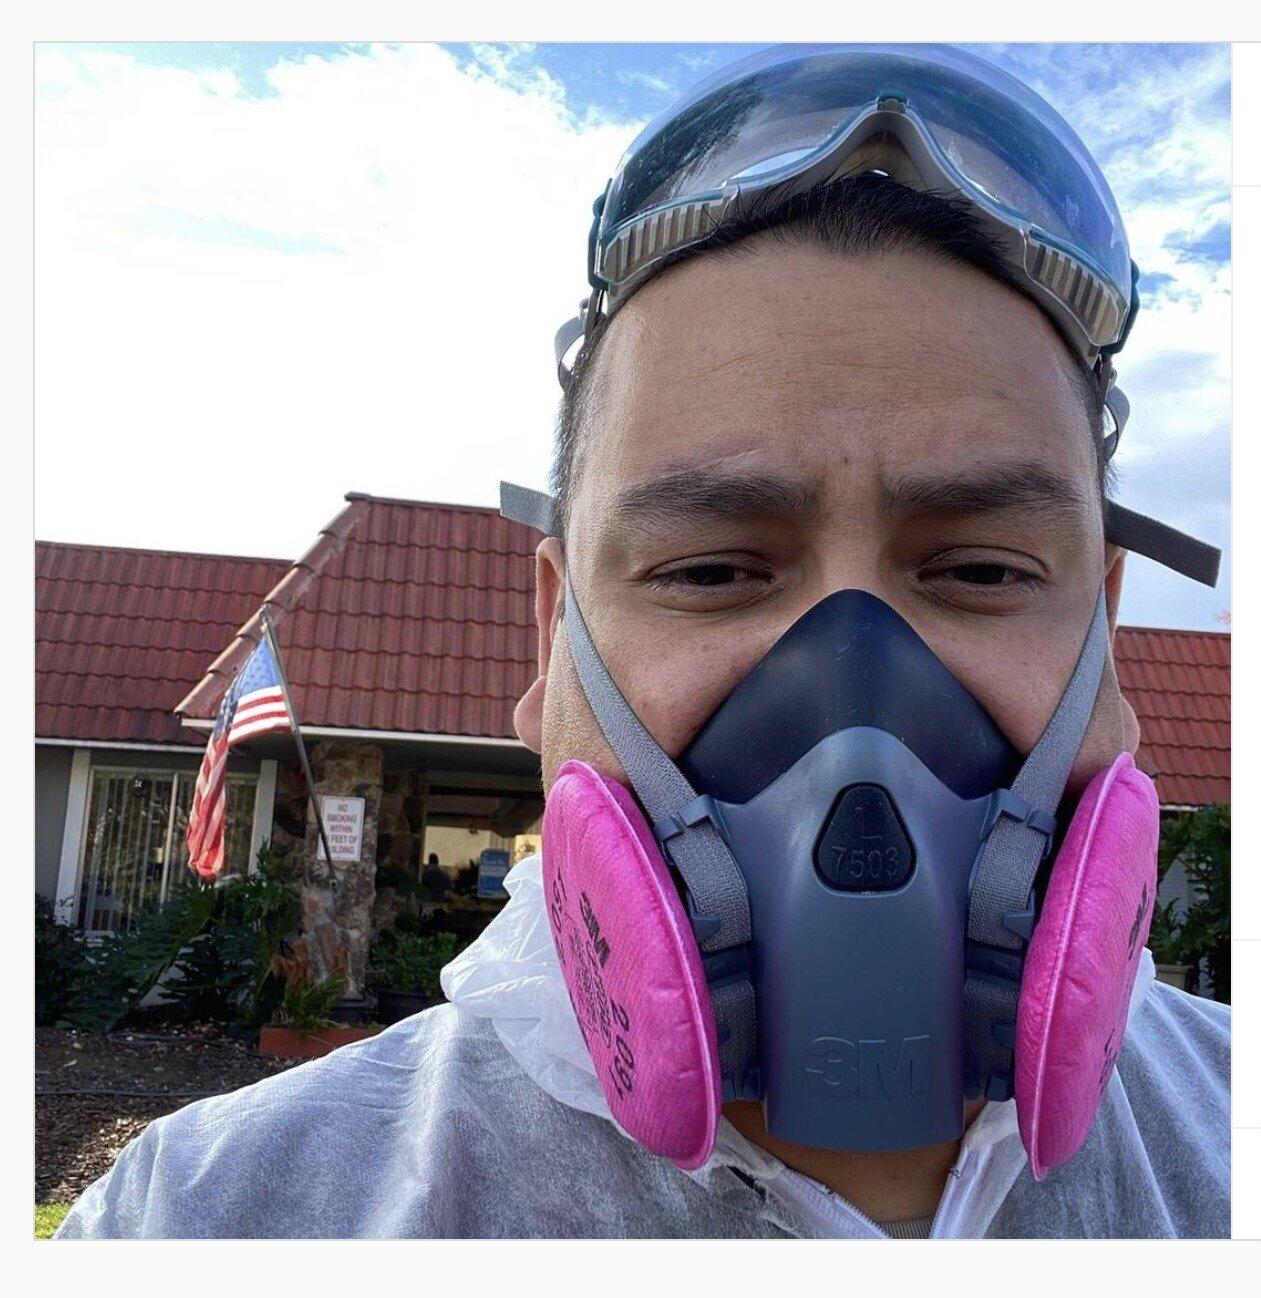 12/12/2020:@drphilrn发表关于接收他的弹性呼吸器面膜+ P100过滤器从PPE护理包装项目捐赠的评论意味着对他来说意味着。